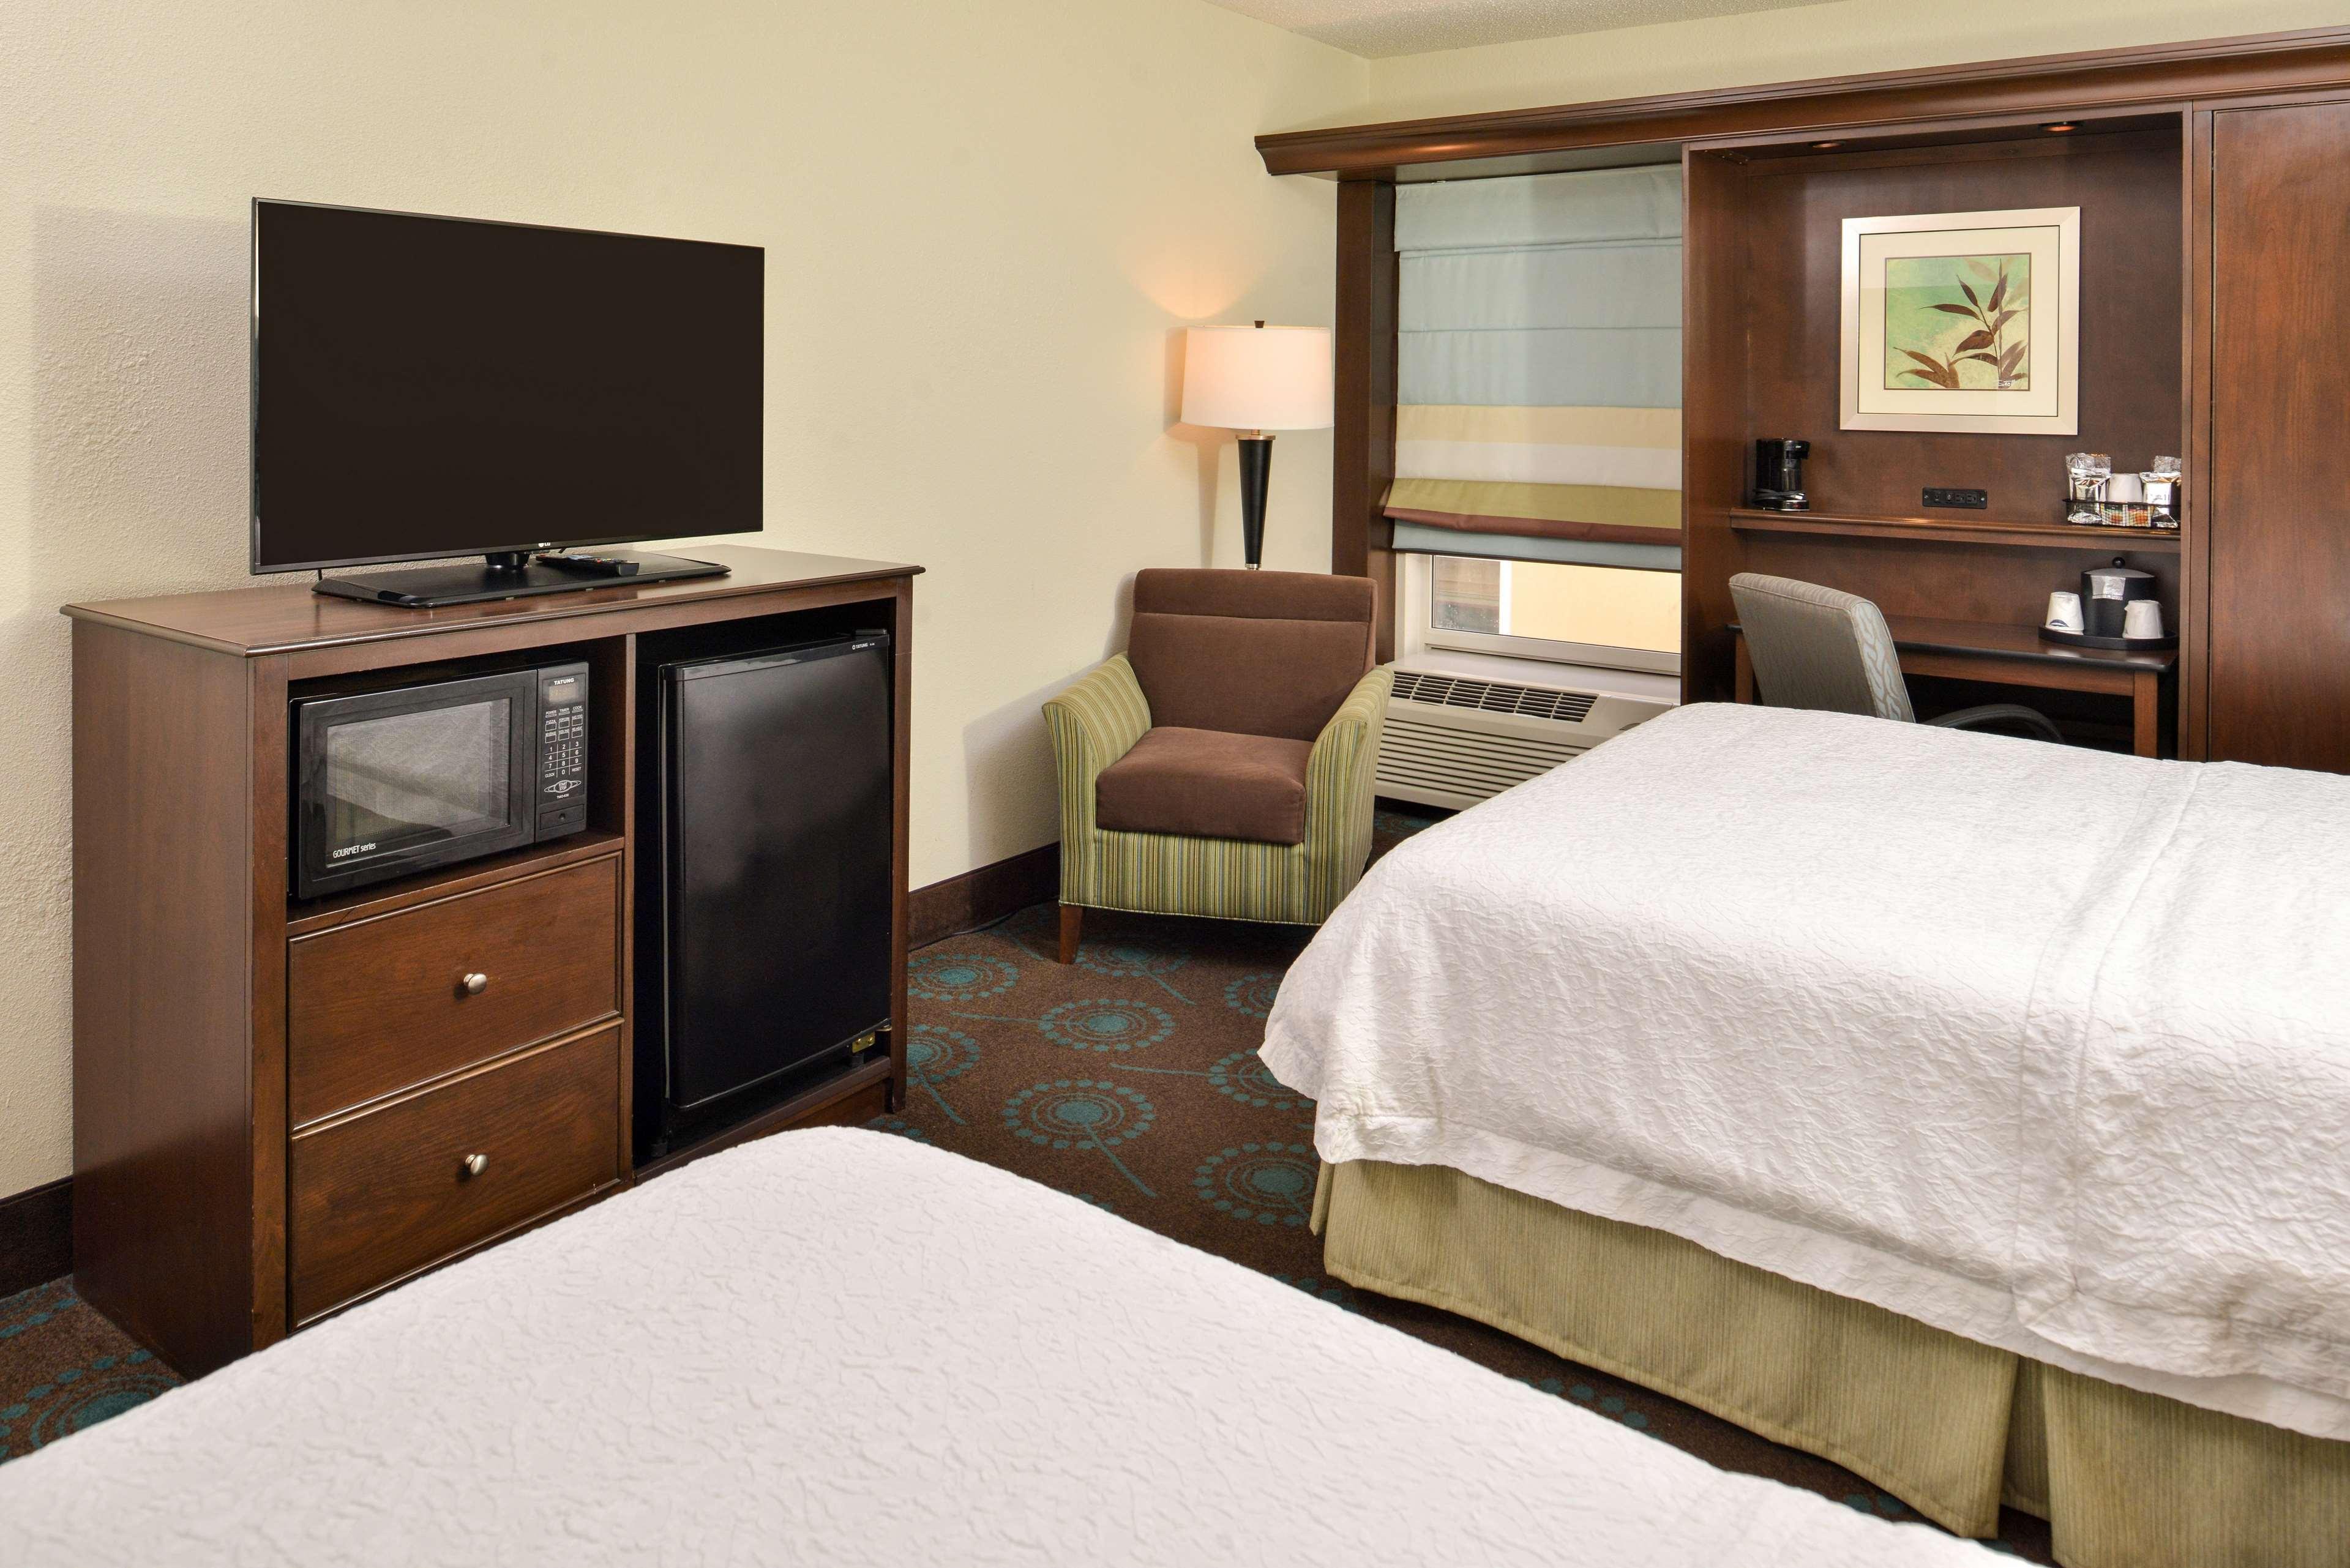 Hampton Inn & Suites Newport News (Oyster Point) image 19